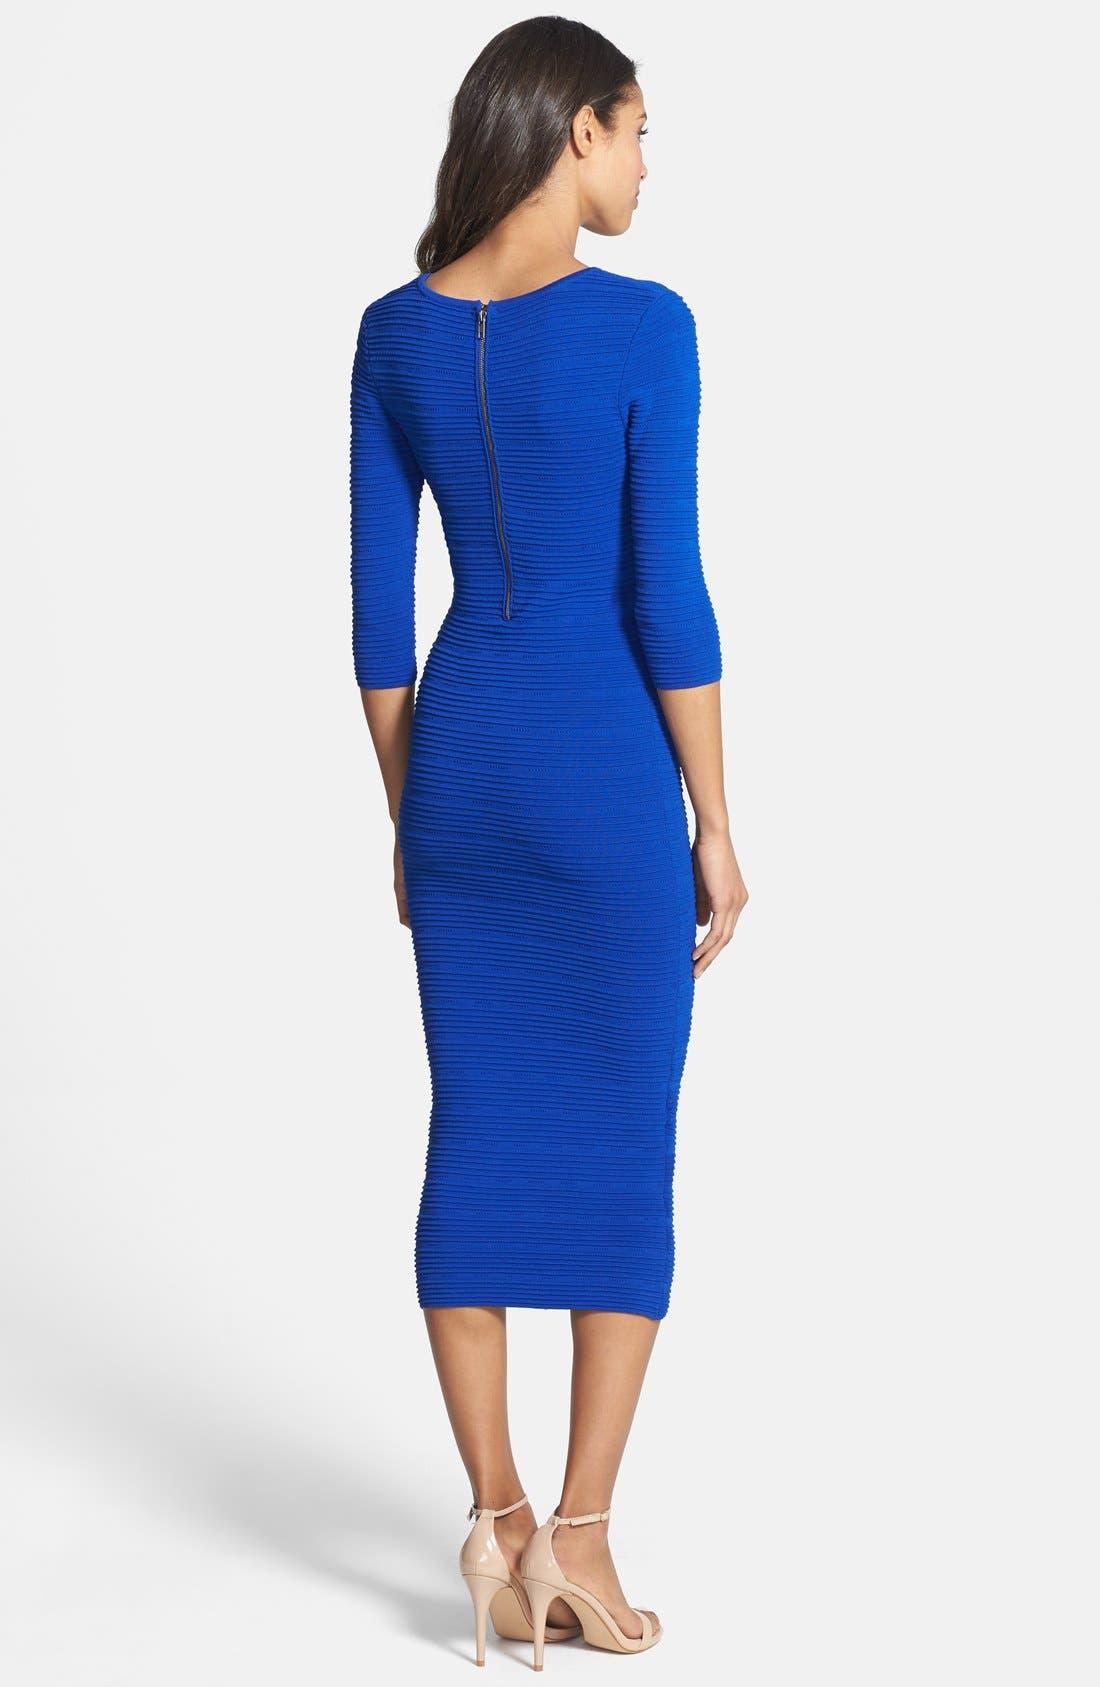 Alternate Image 2  - Felicity & Coco Knit Body-Con Midi Dress (Nordstrom Exclusive)